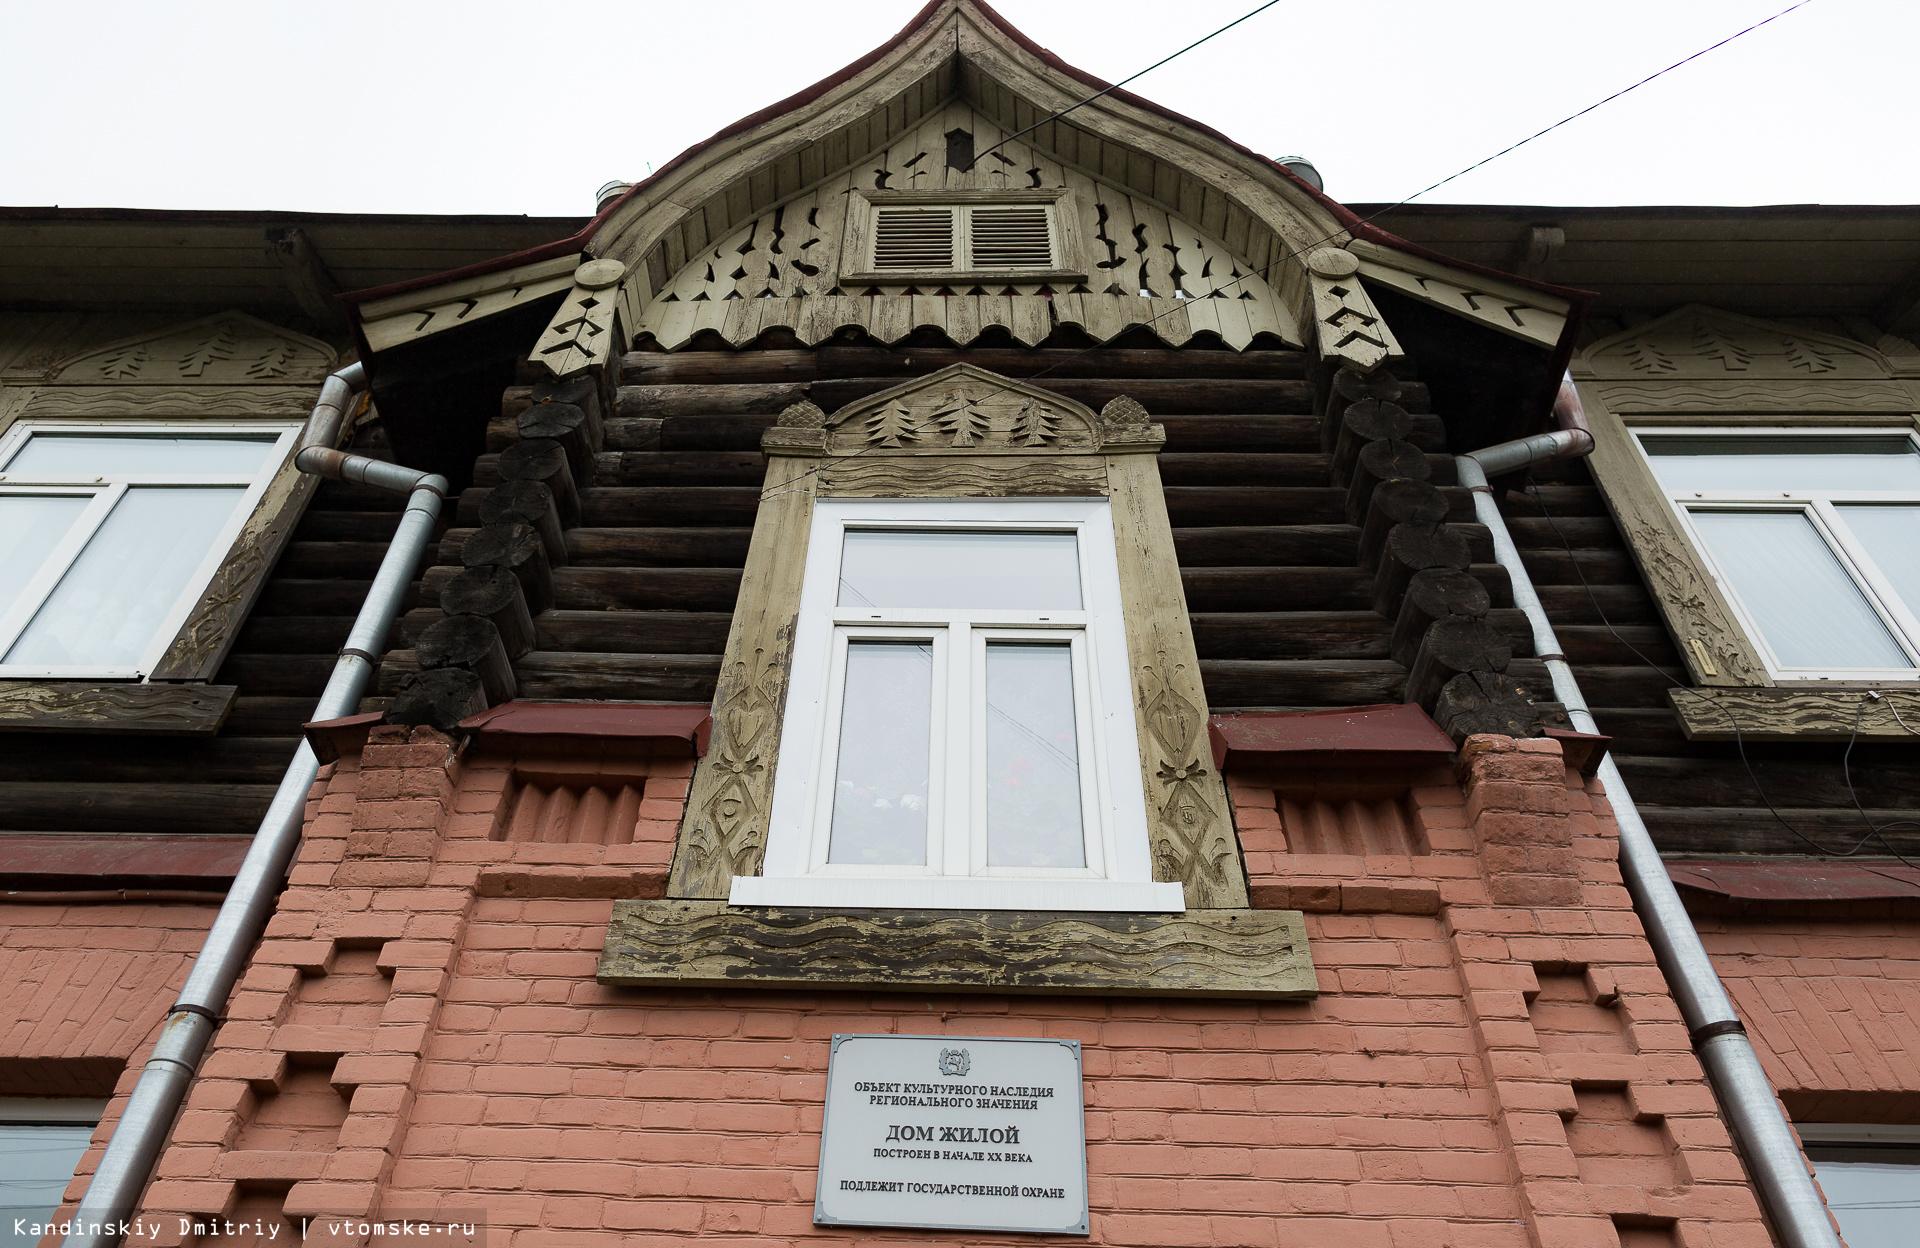 Своими руками: общественники взялись за реставрацию фасада томского дома-памятника